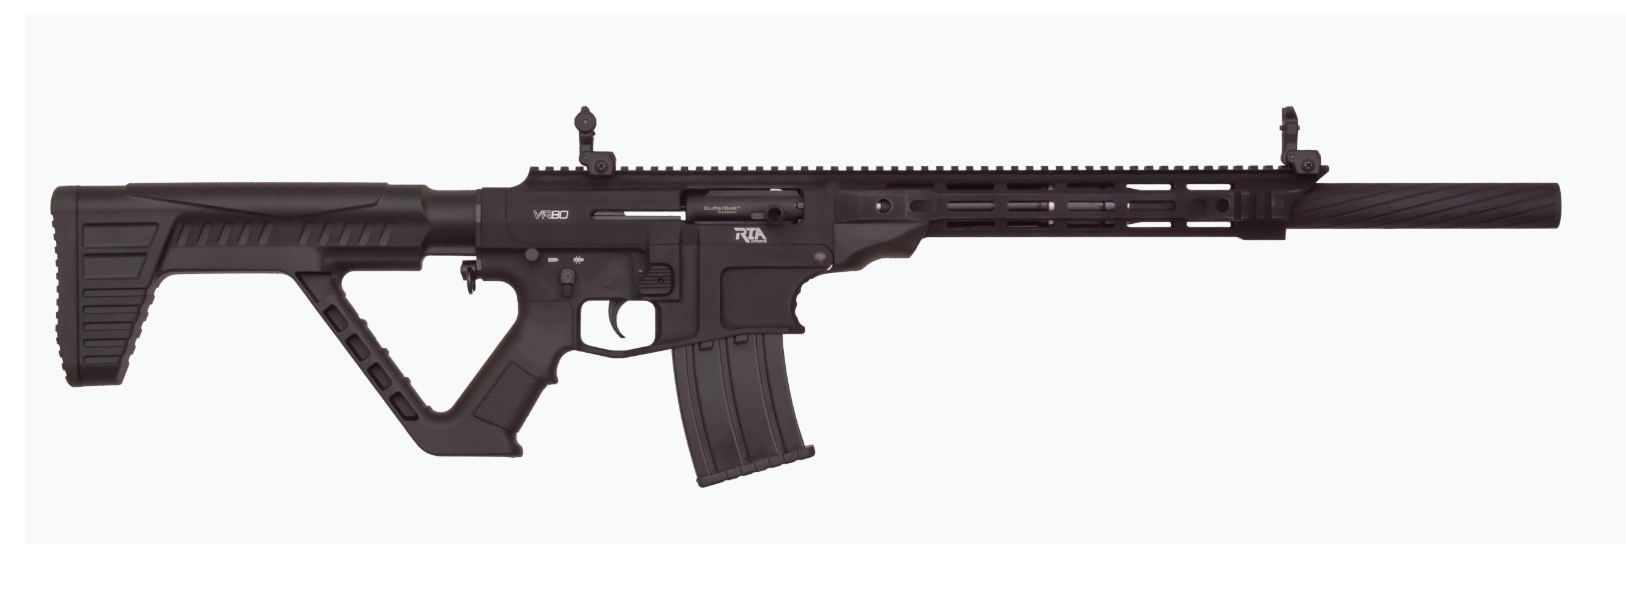 Rock Island Armory VR80 SHOTGUN CALIFORNIA COMPLY 12 GAUGE